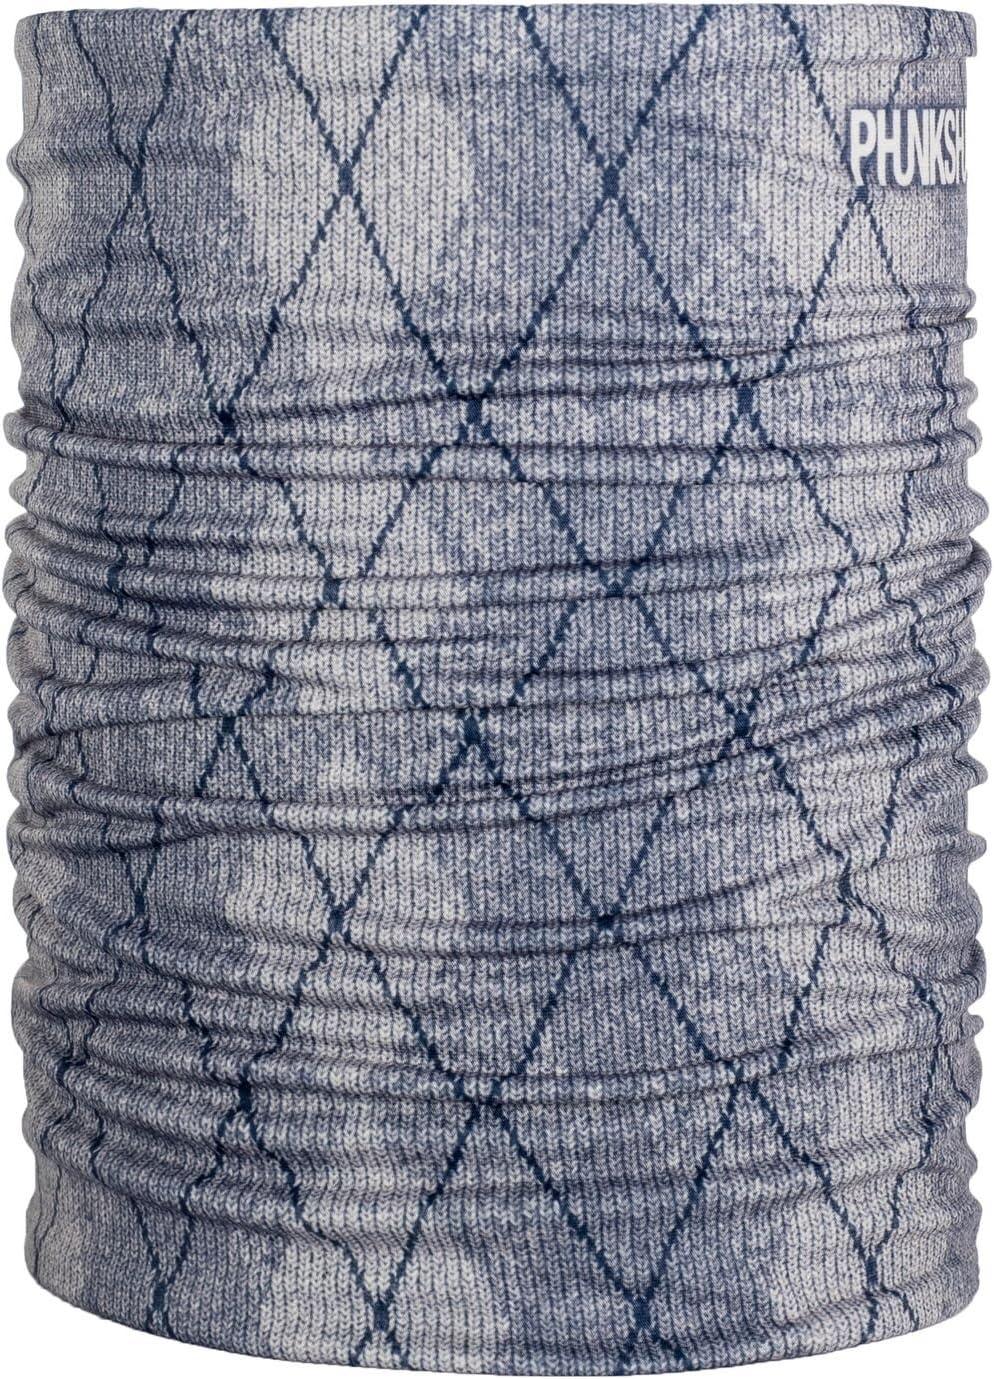 Phunkshun Wear – Double Layer Thermal Neck Tube